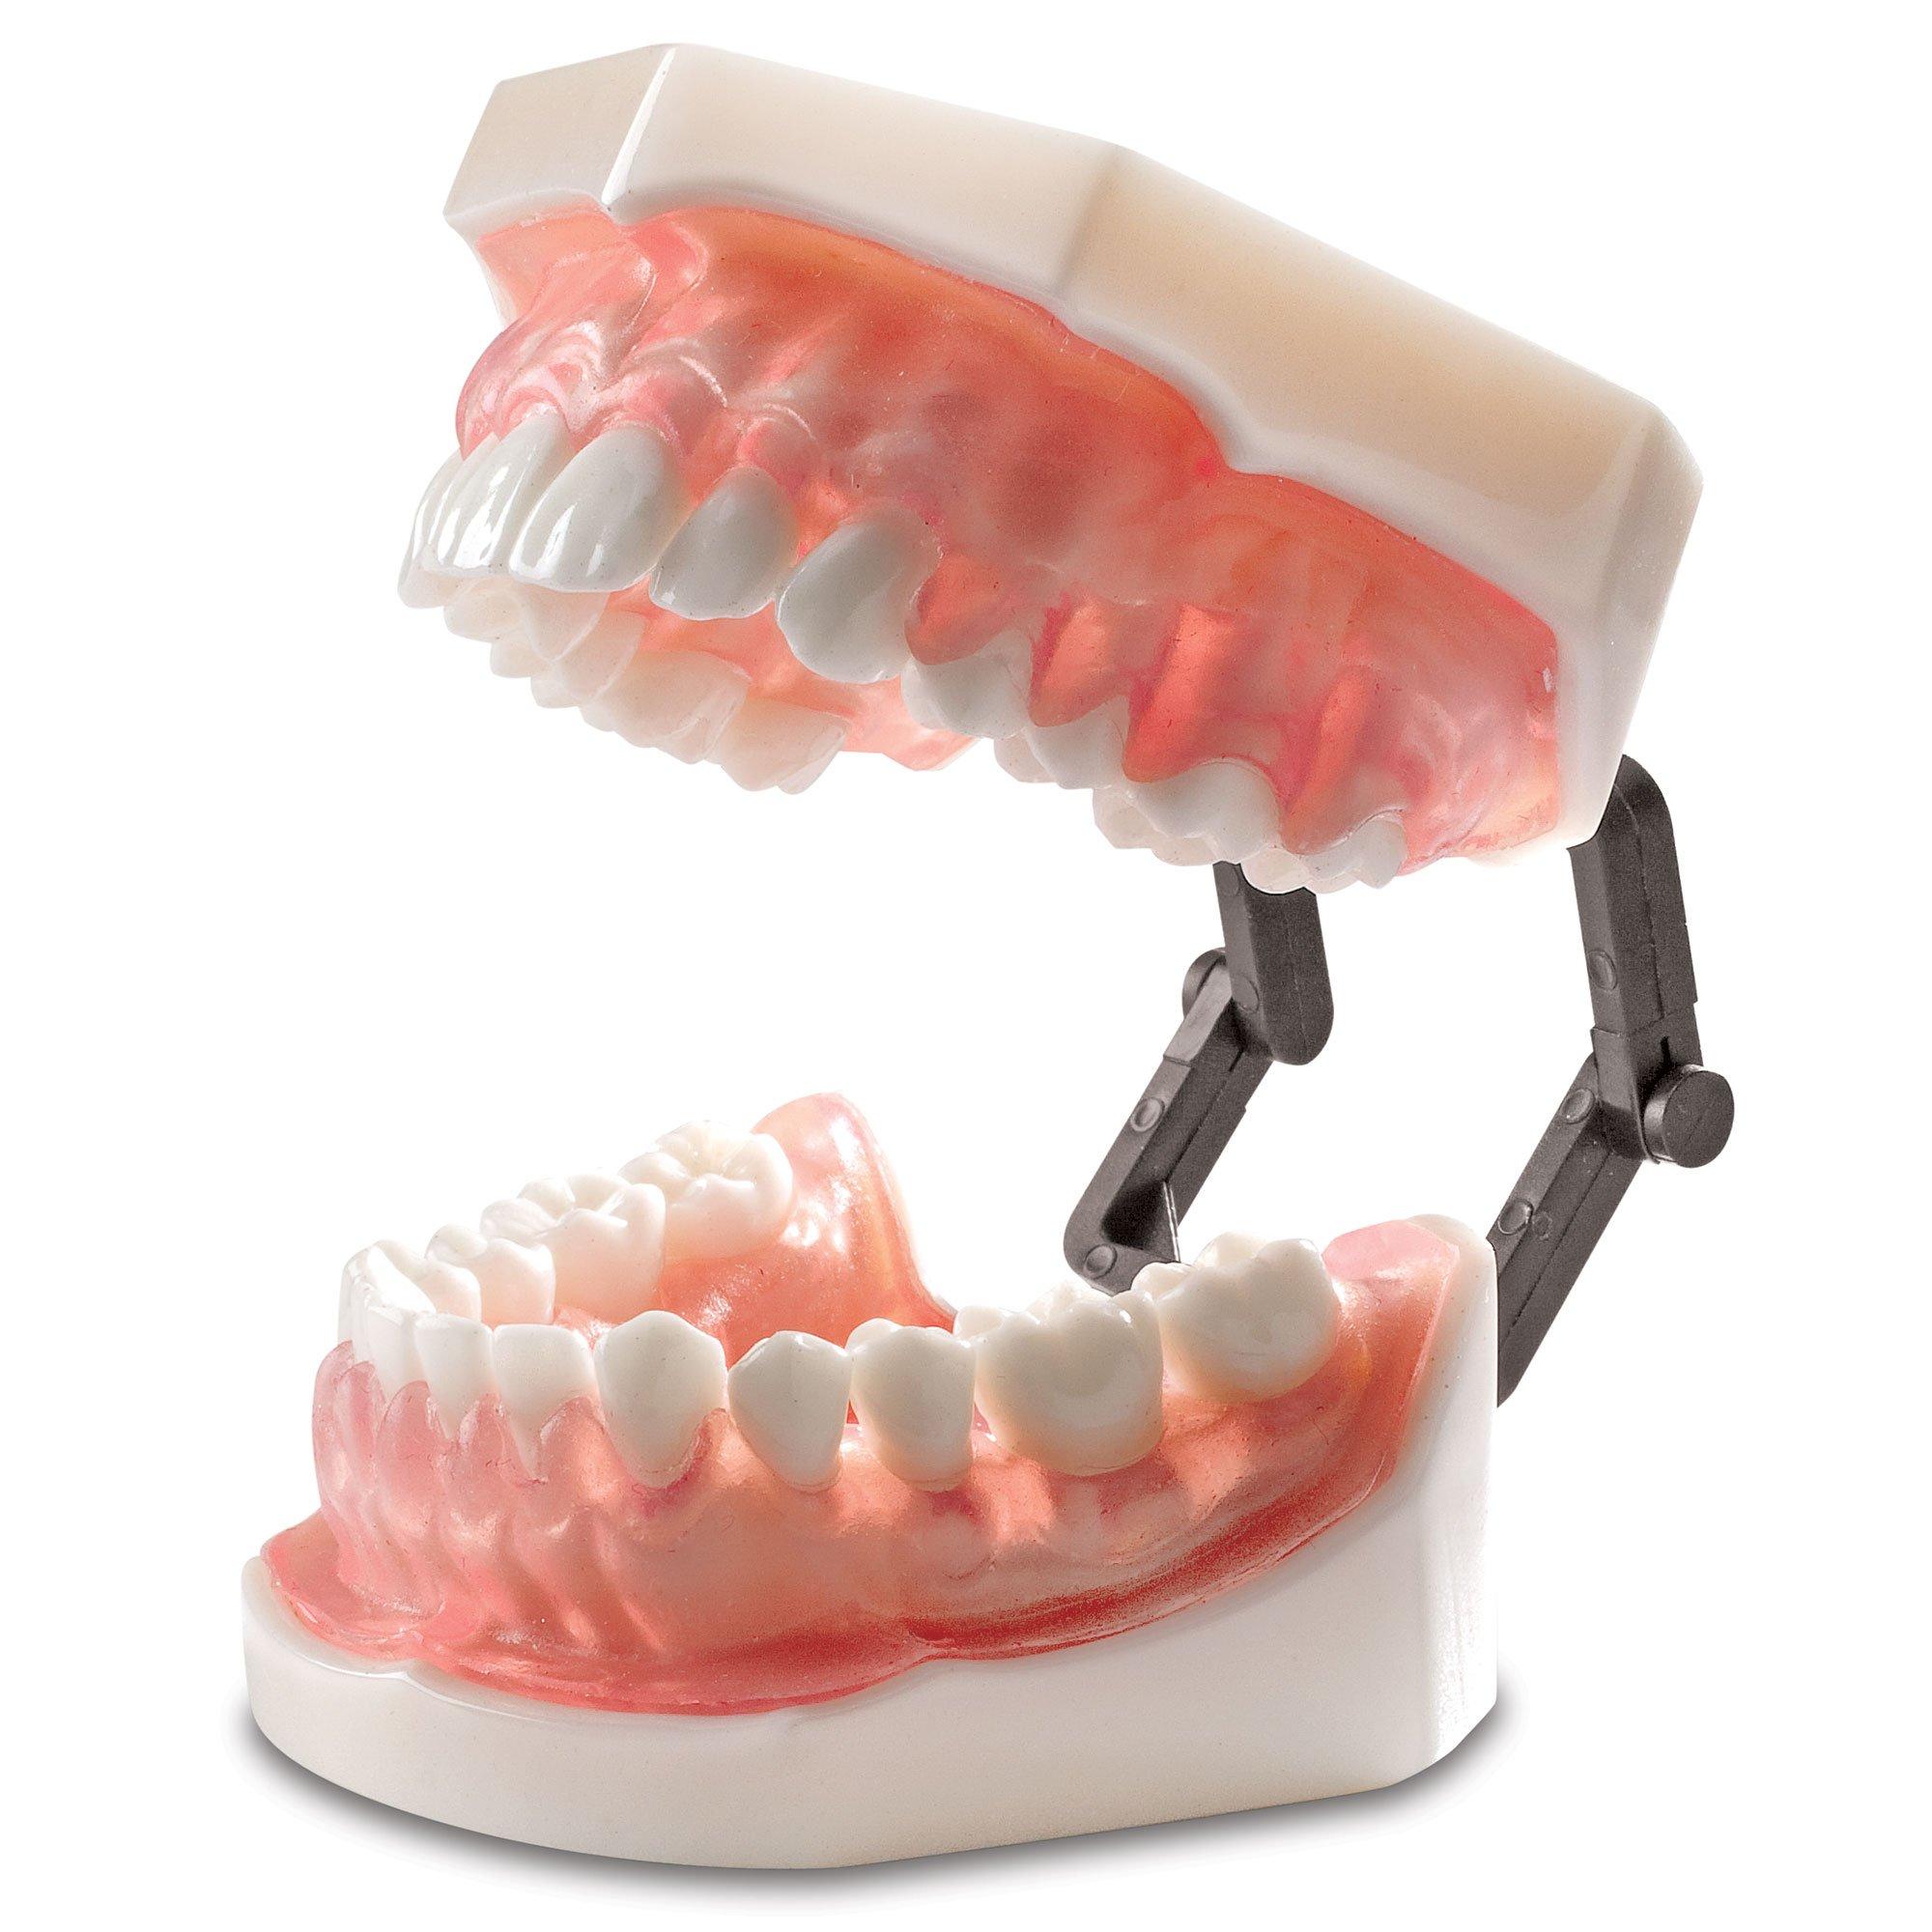 Practicon 4112125 Bone Absorption Model